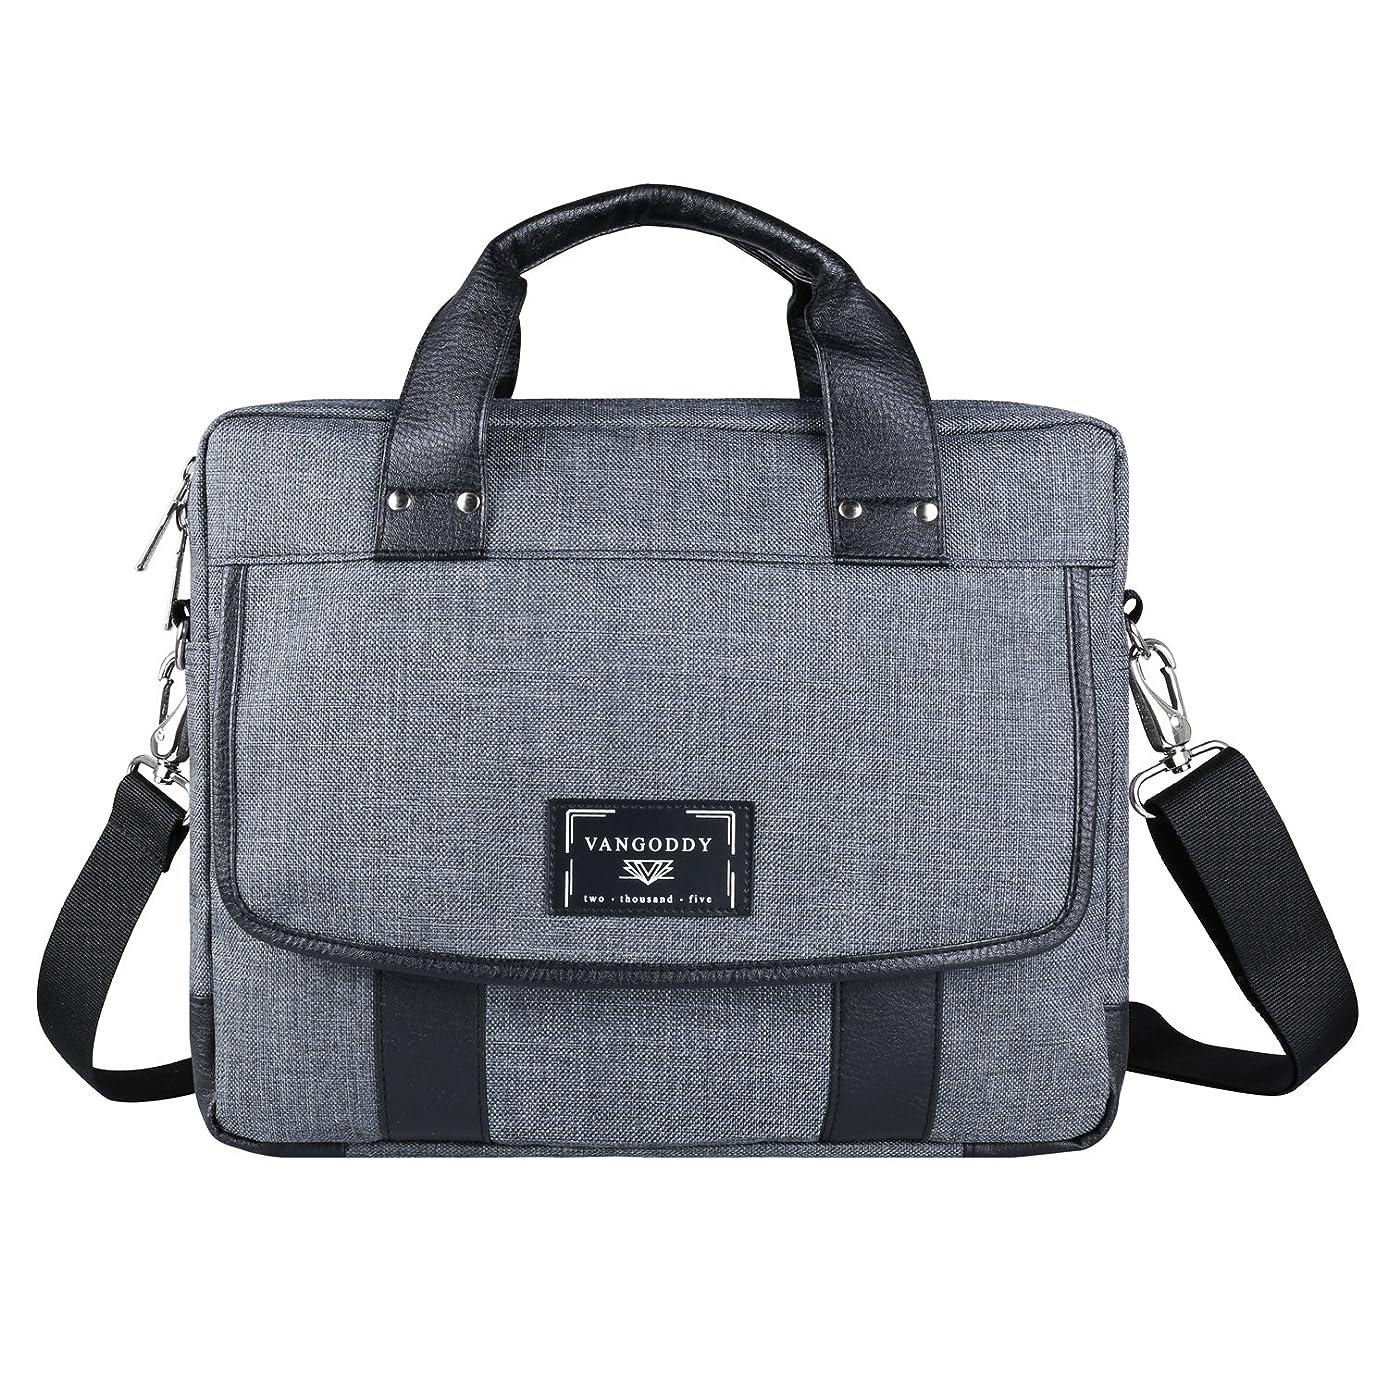 360° Protective Laptop Shoulder Bag Compatible 11-12 Inch for Acer Chromebook 11 / Spin 1 / Switch 3